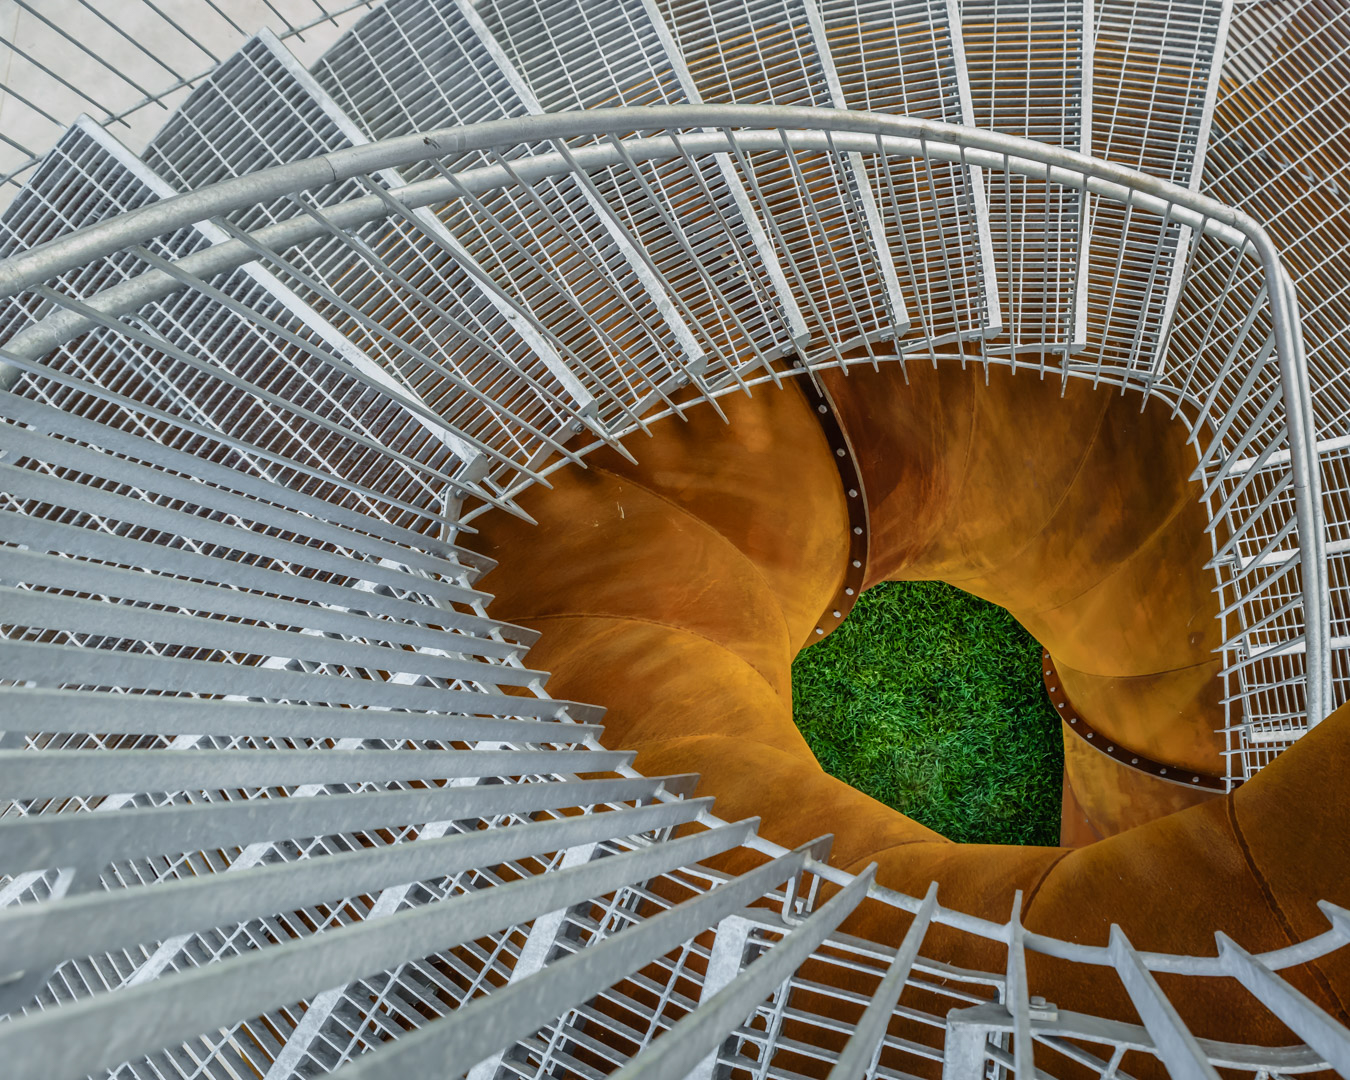 Escalier rotatoire